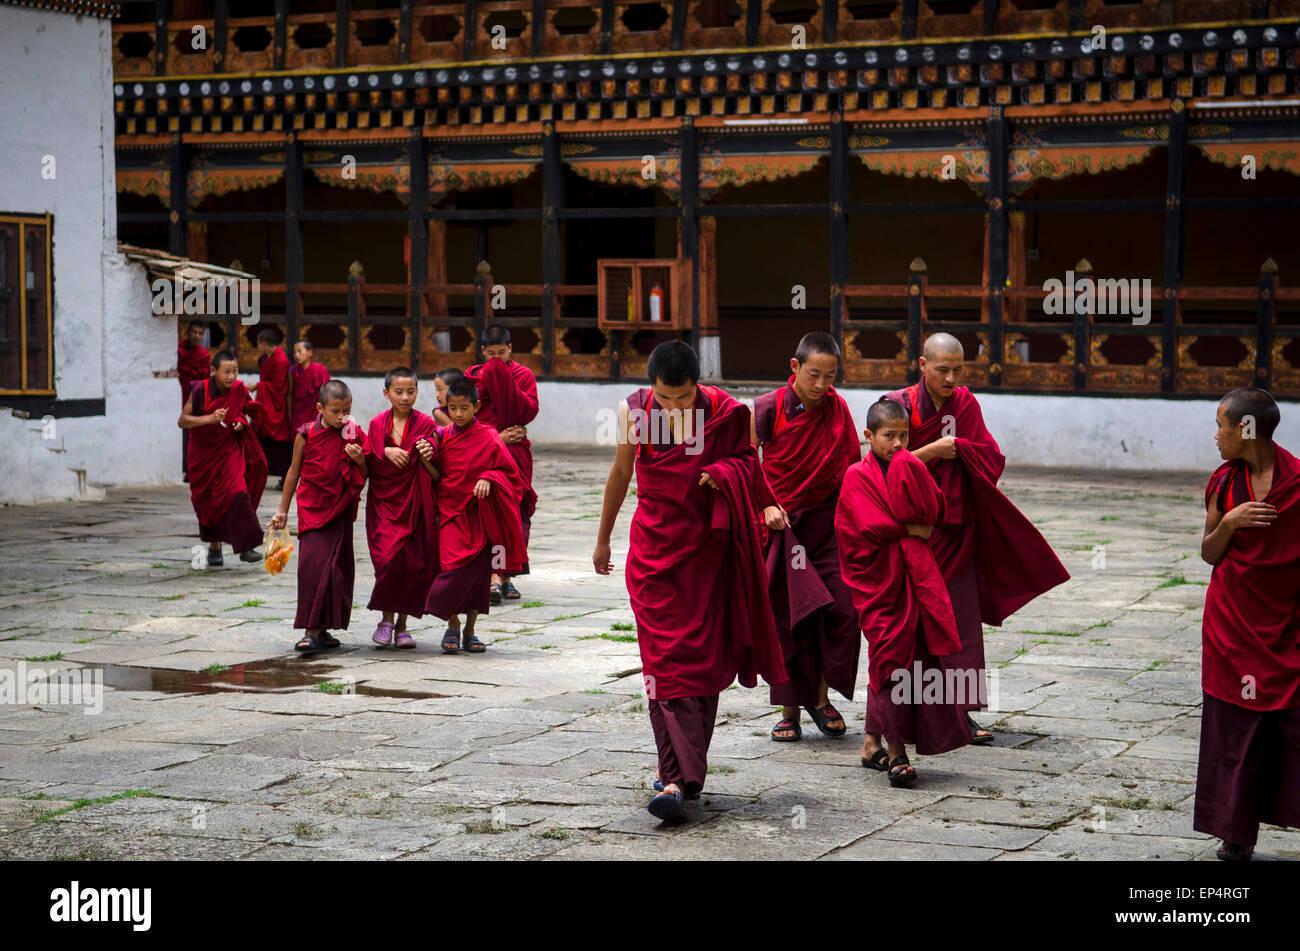 Young monks in Paro Dzong, Paro, Bhutan - Stock Image